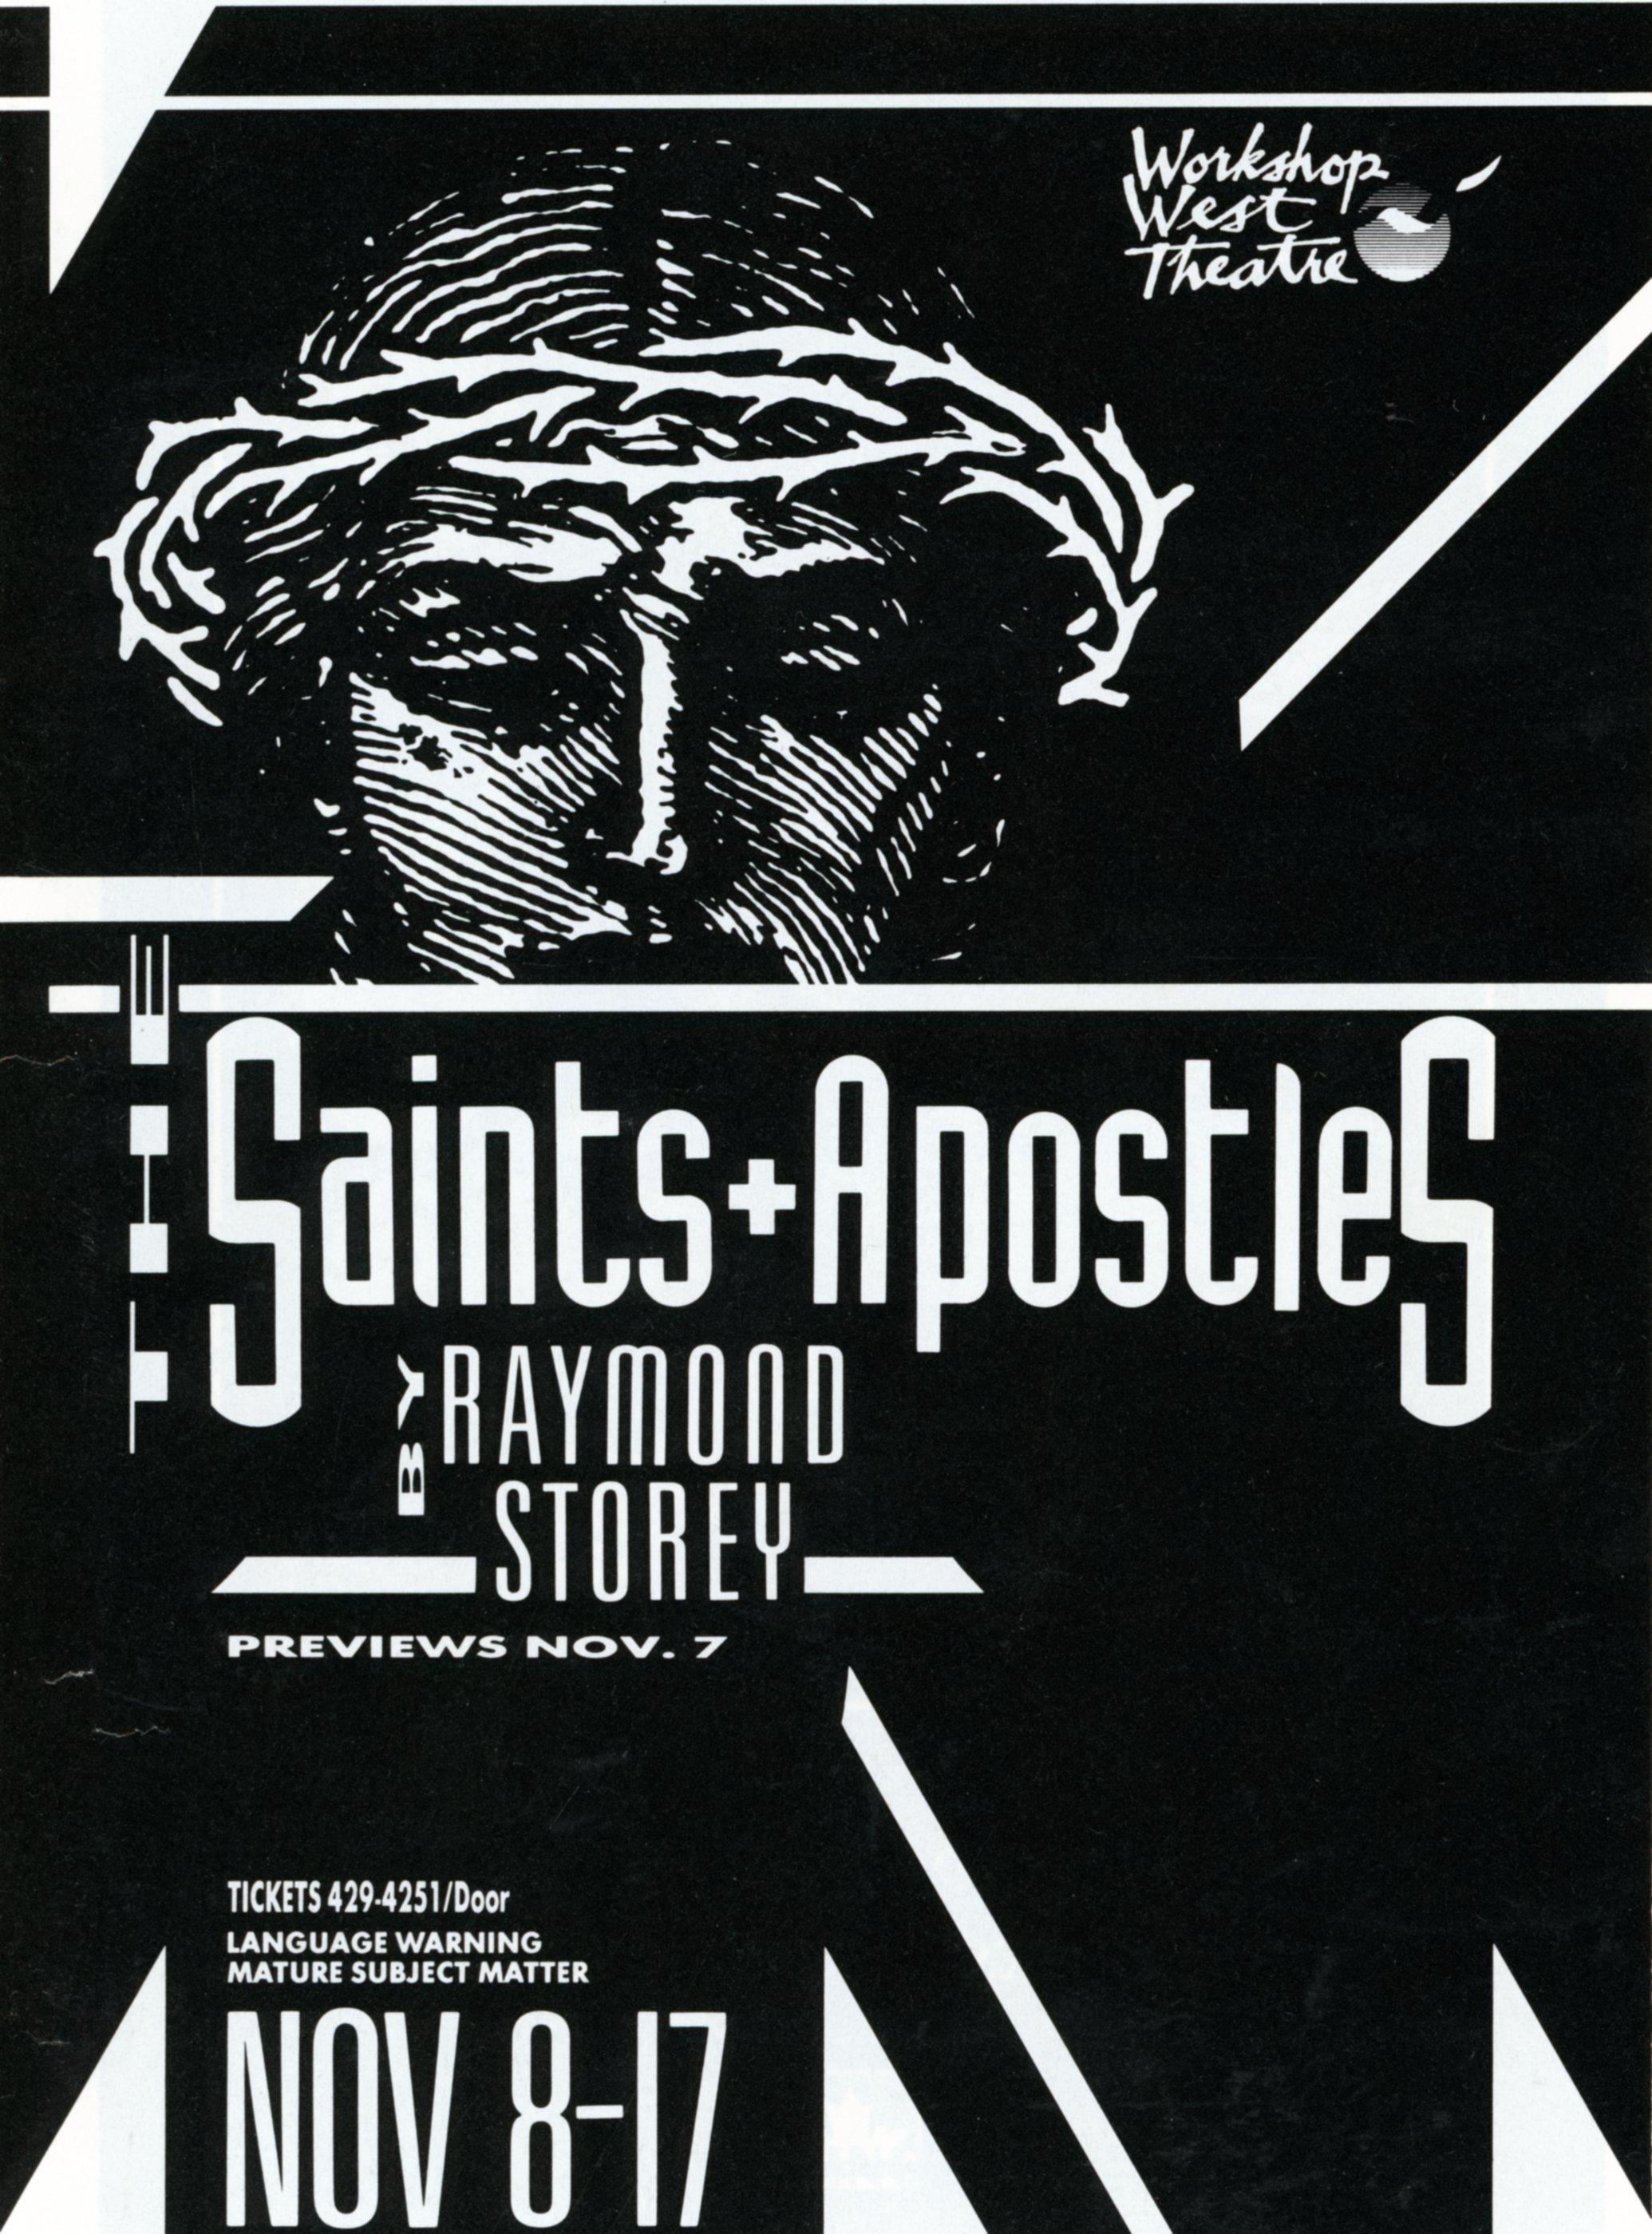 The Saints And Apostles (November, 1991) -Program Cover JPEG.jpg